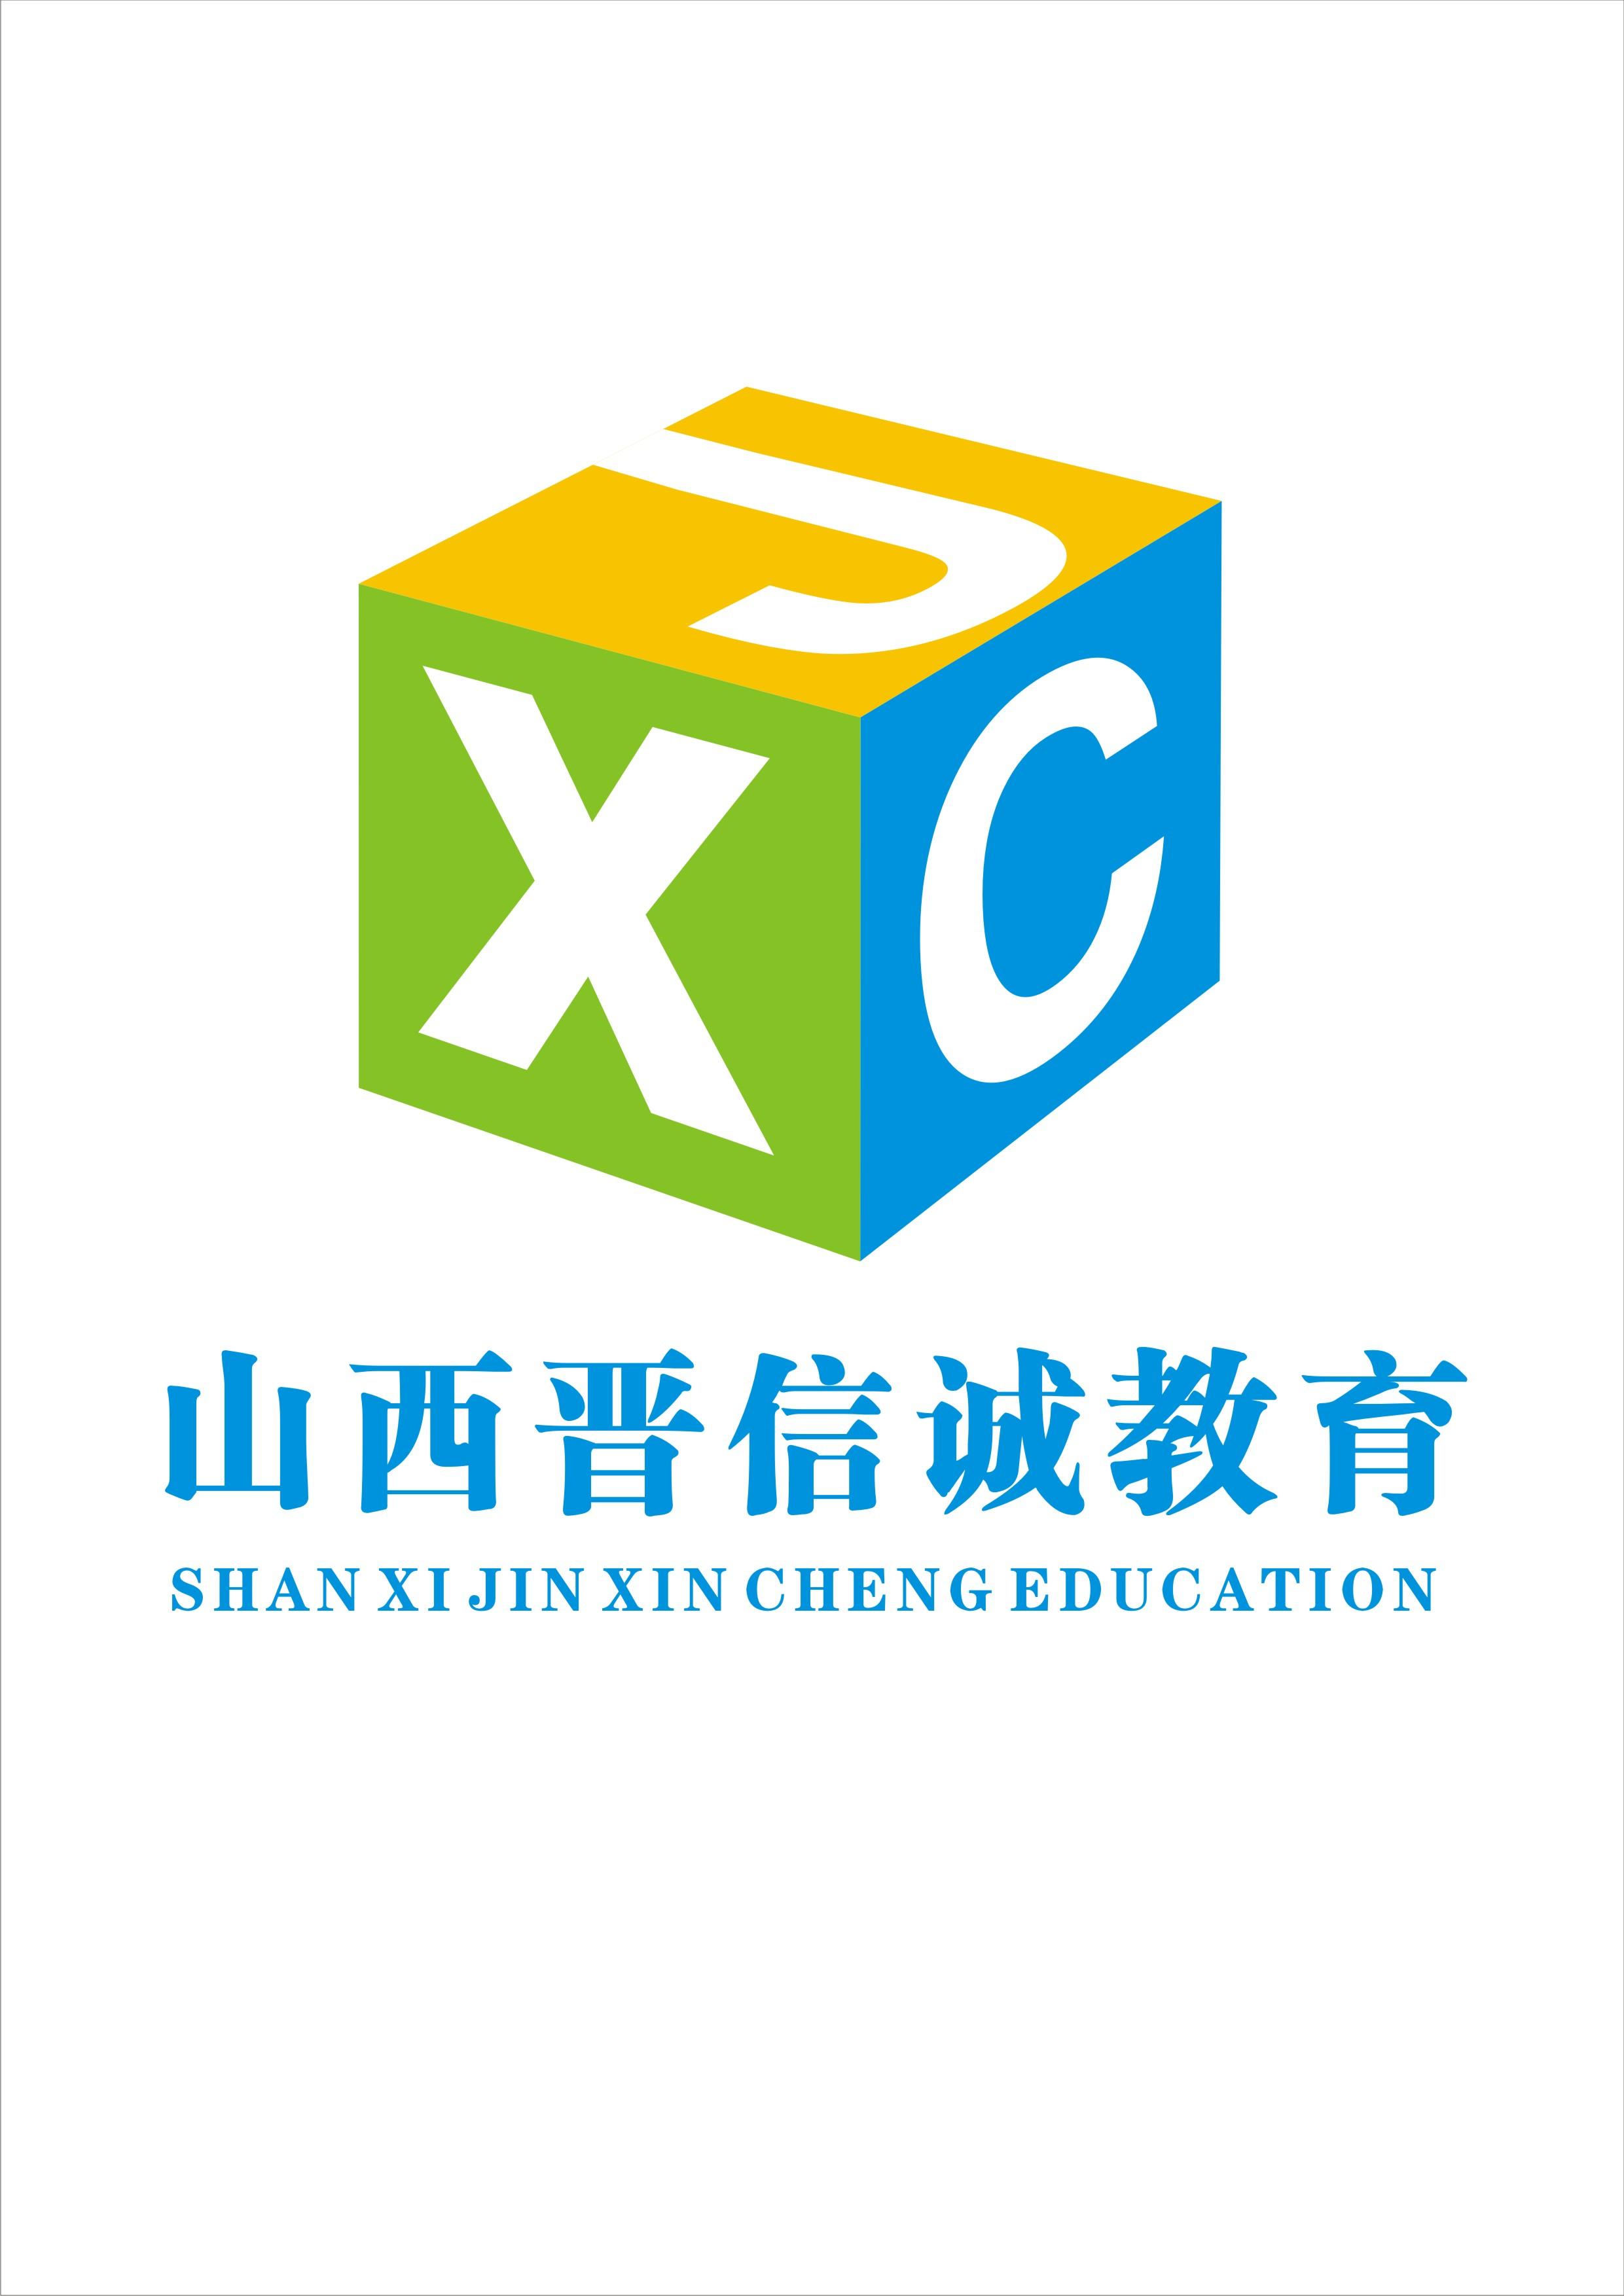 logo logo 标志 设计 图标 2481_3508 竖版 竖屏